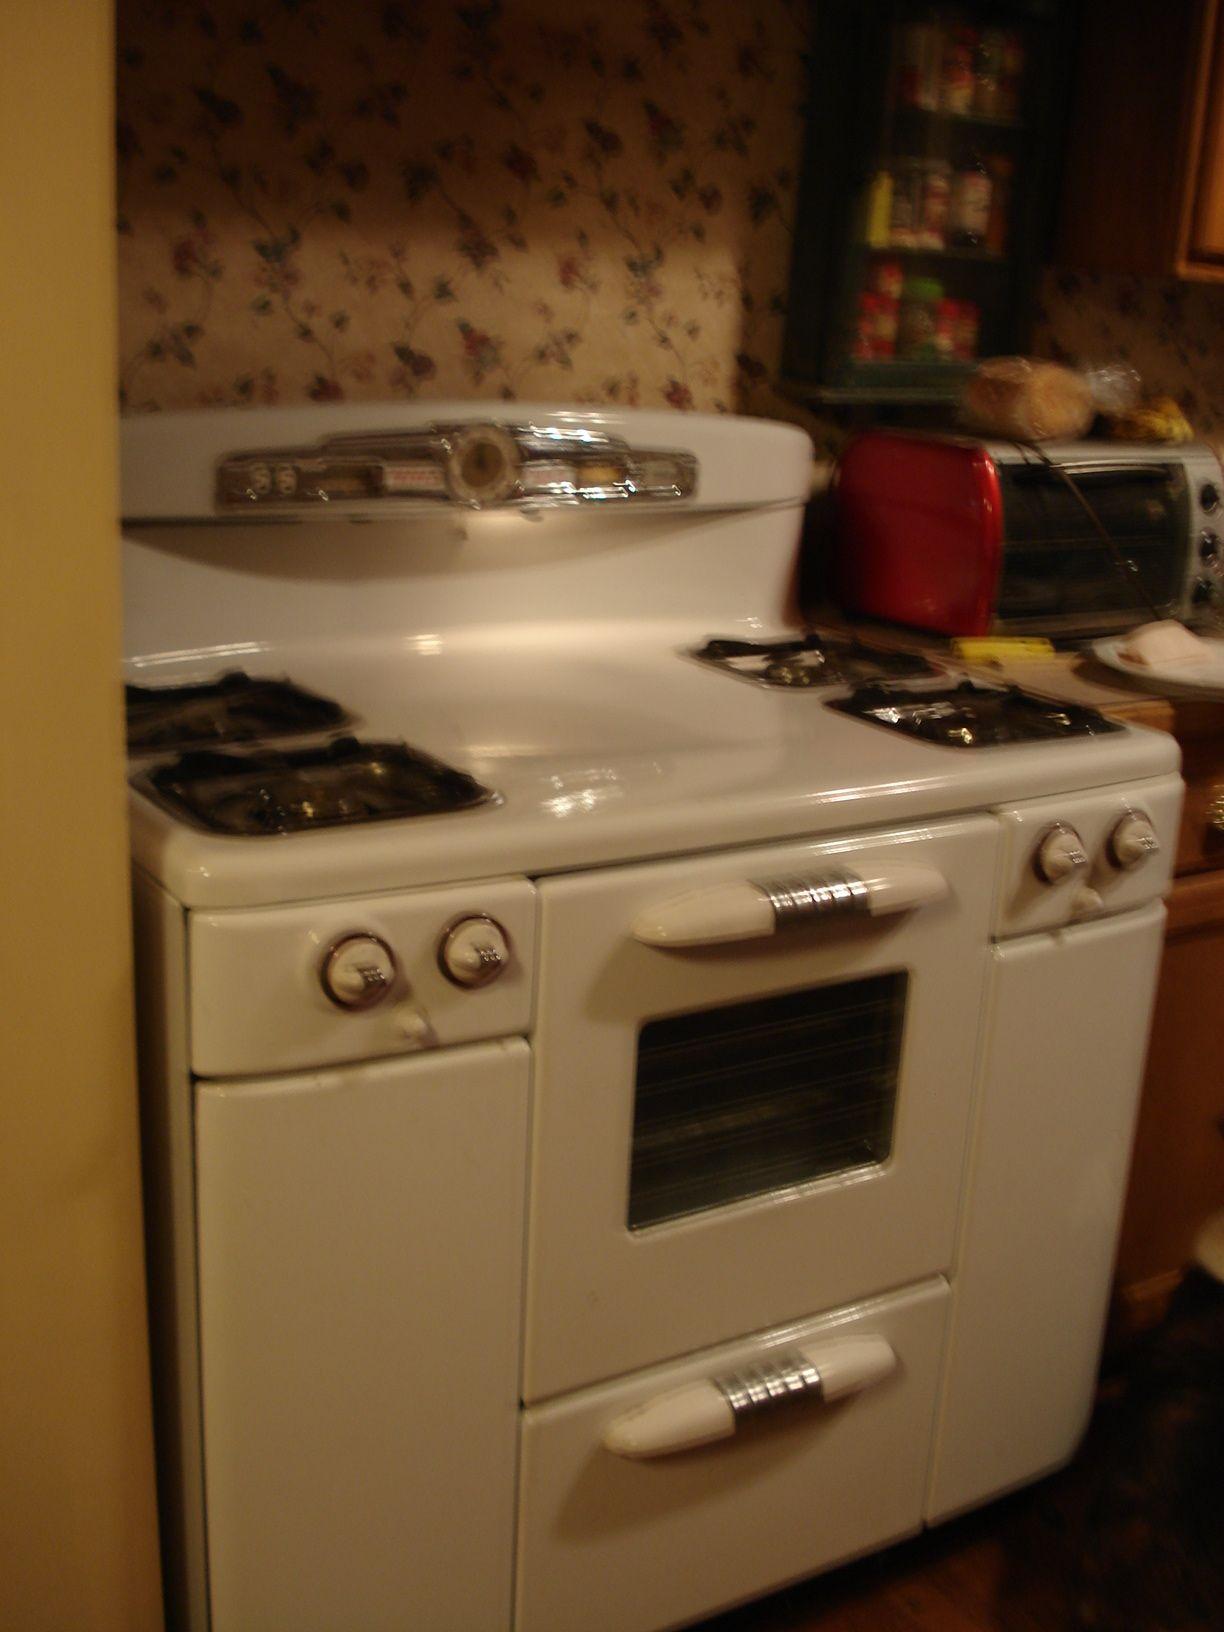 Tappan Deluxe Circa 1949 1953 Vintage Kitchen Appliances Kitchen Design Kitchen